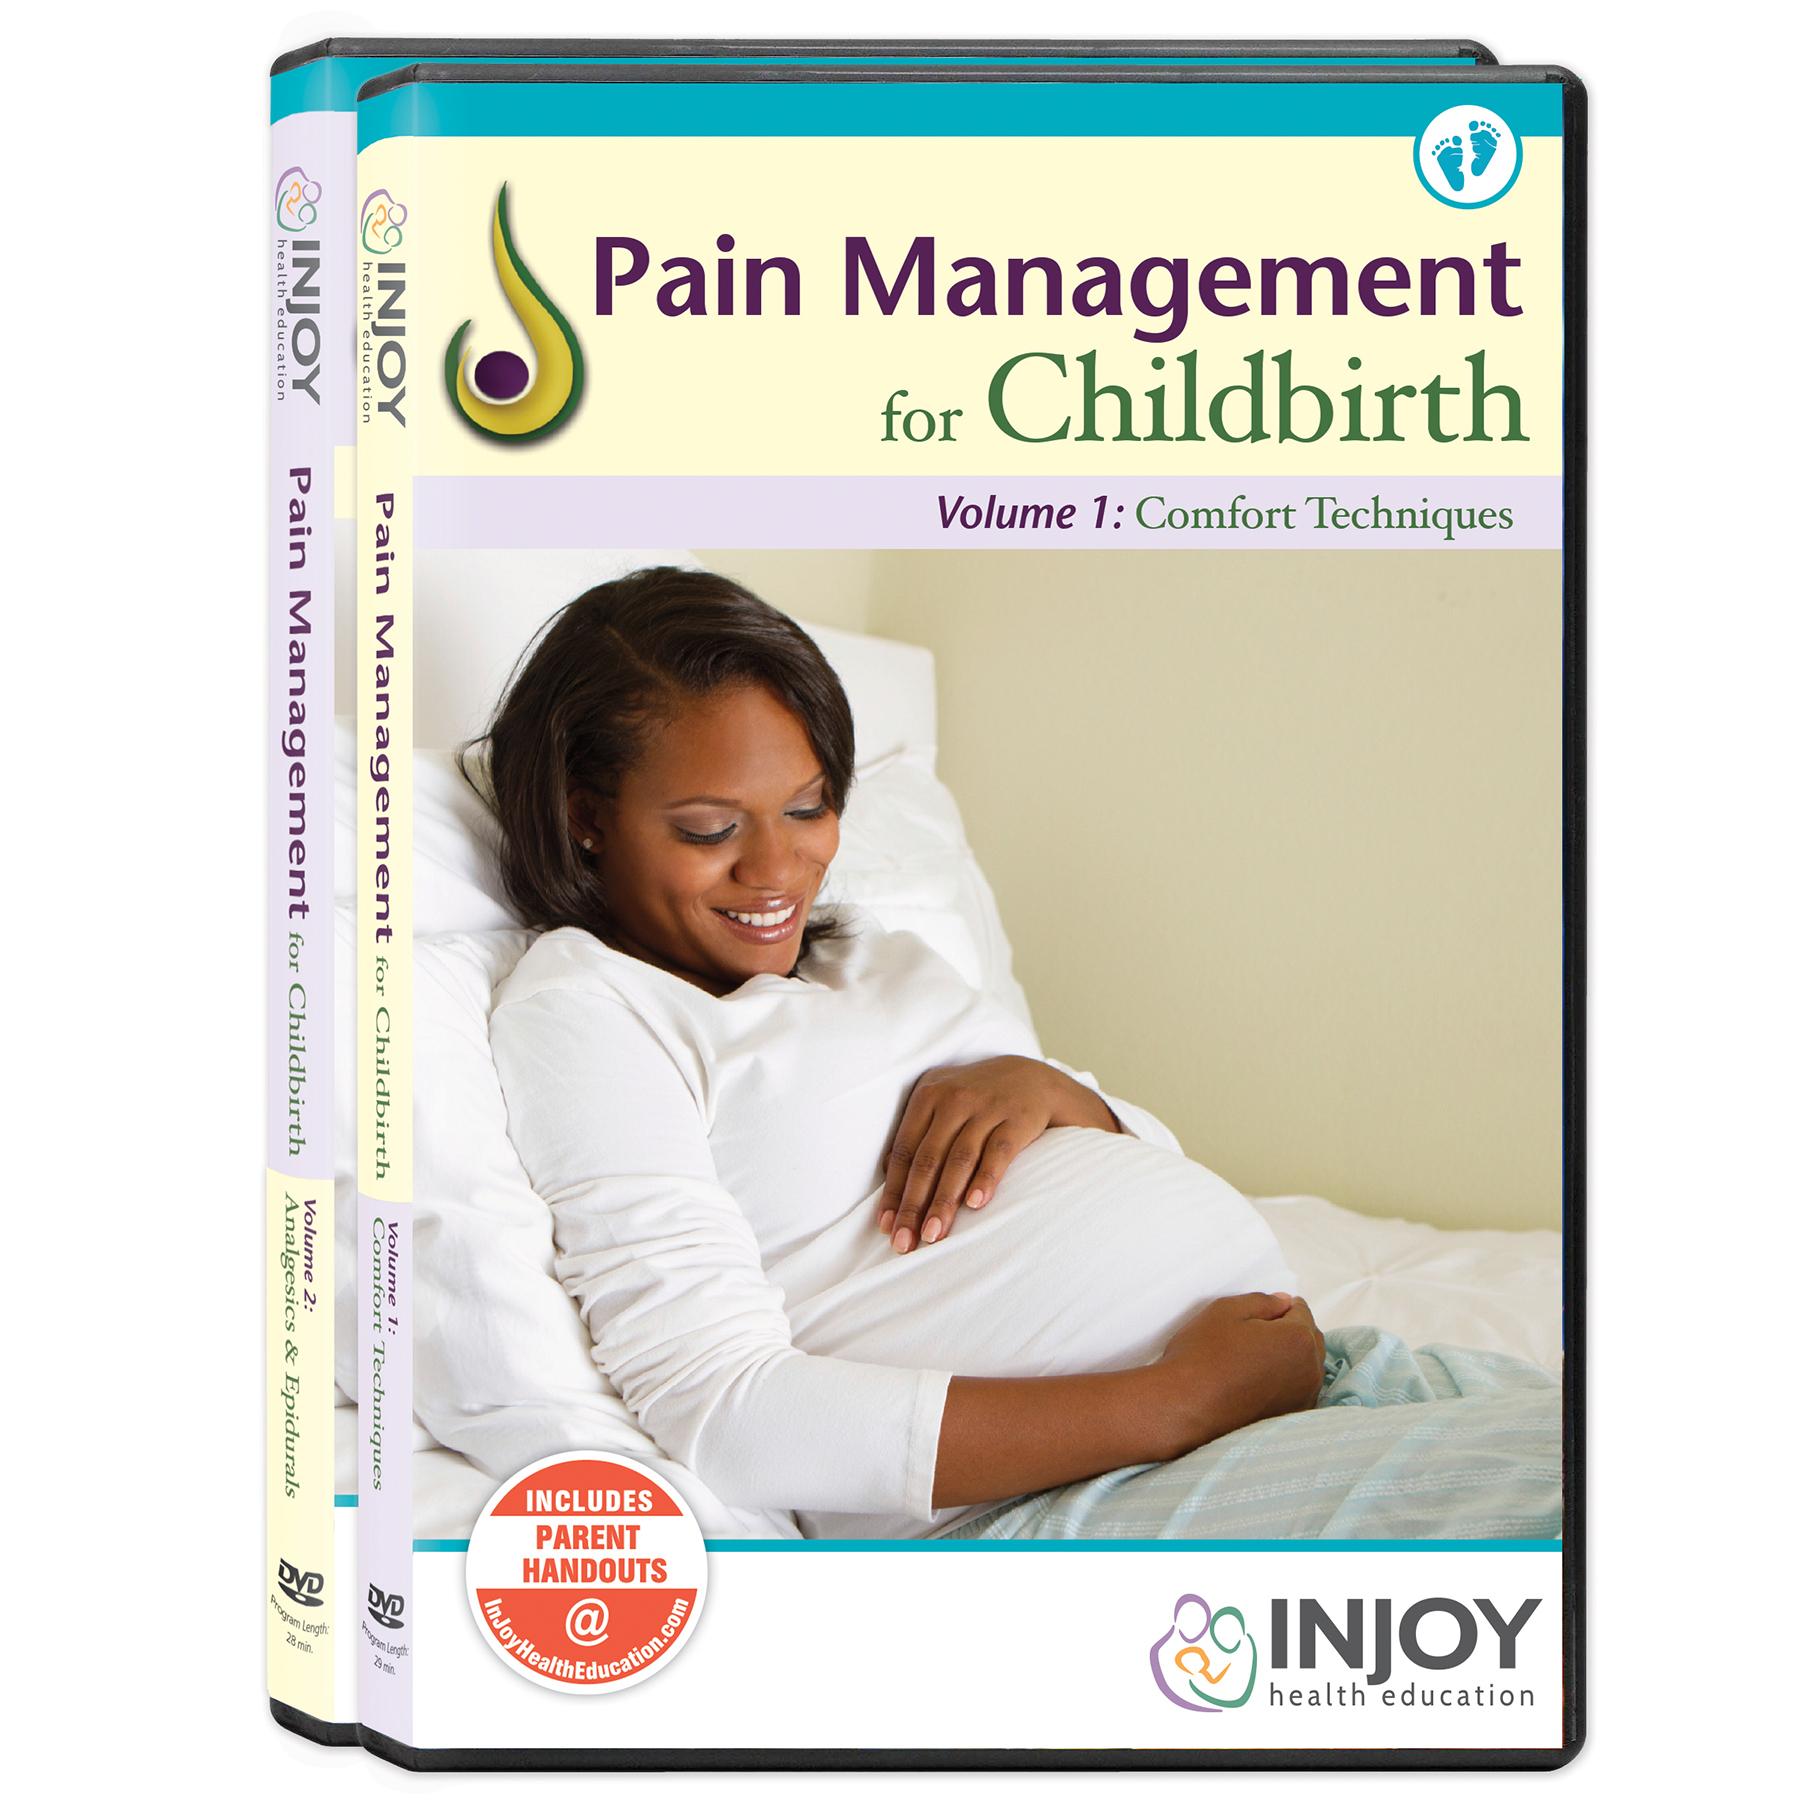 Pain Management for Childbirth DVD Set 2, comfort techniques analgesics and epidurals, Childbirth Graphics, 48865